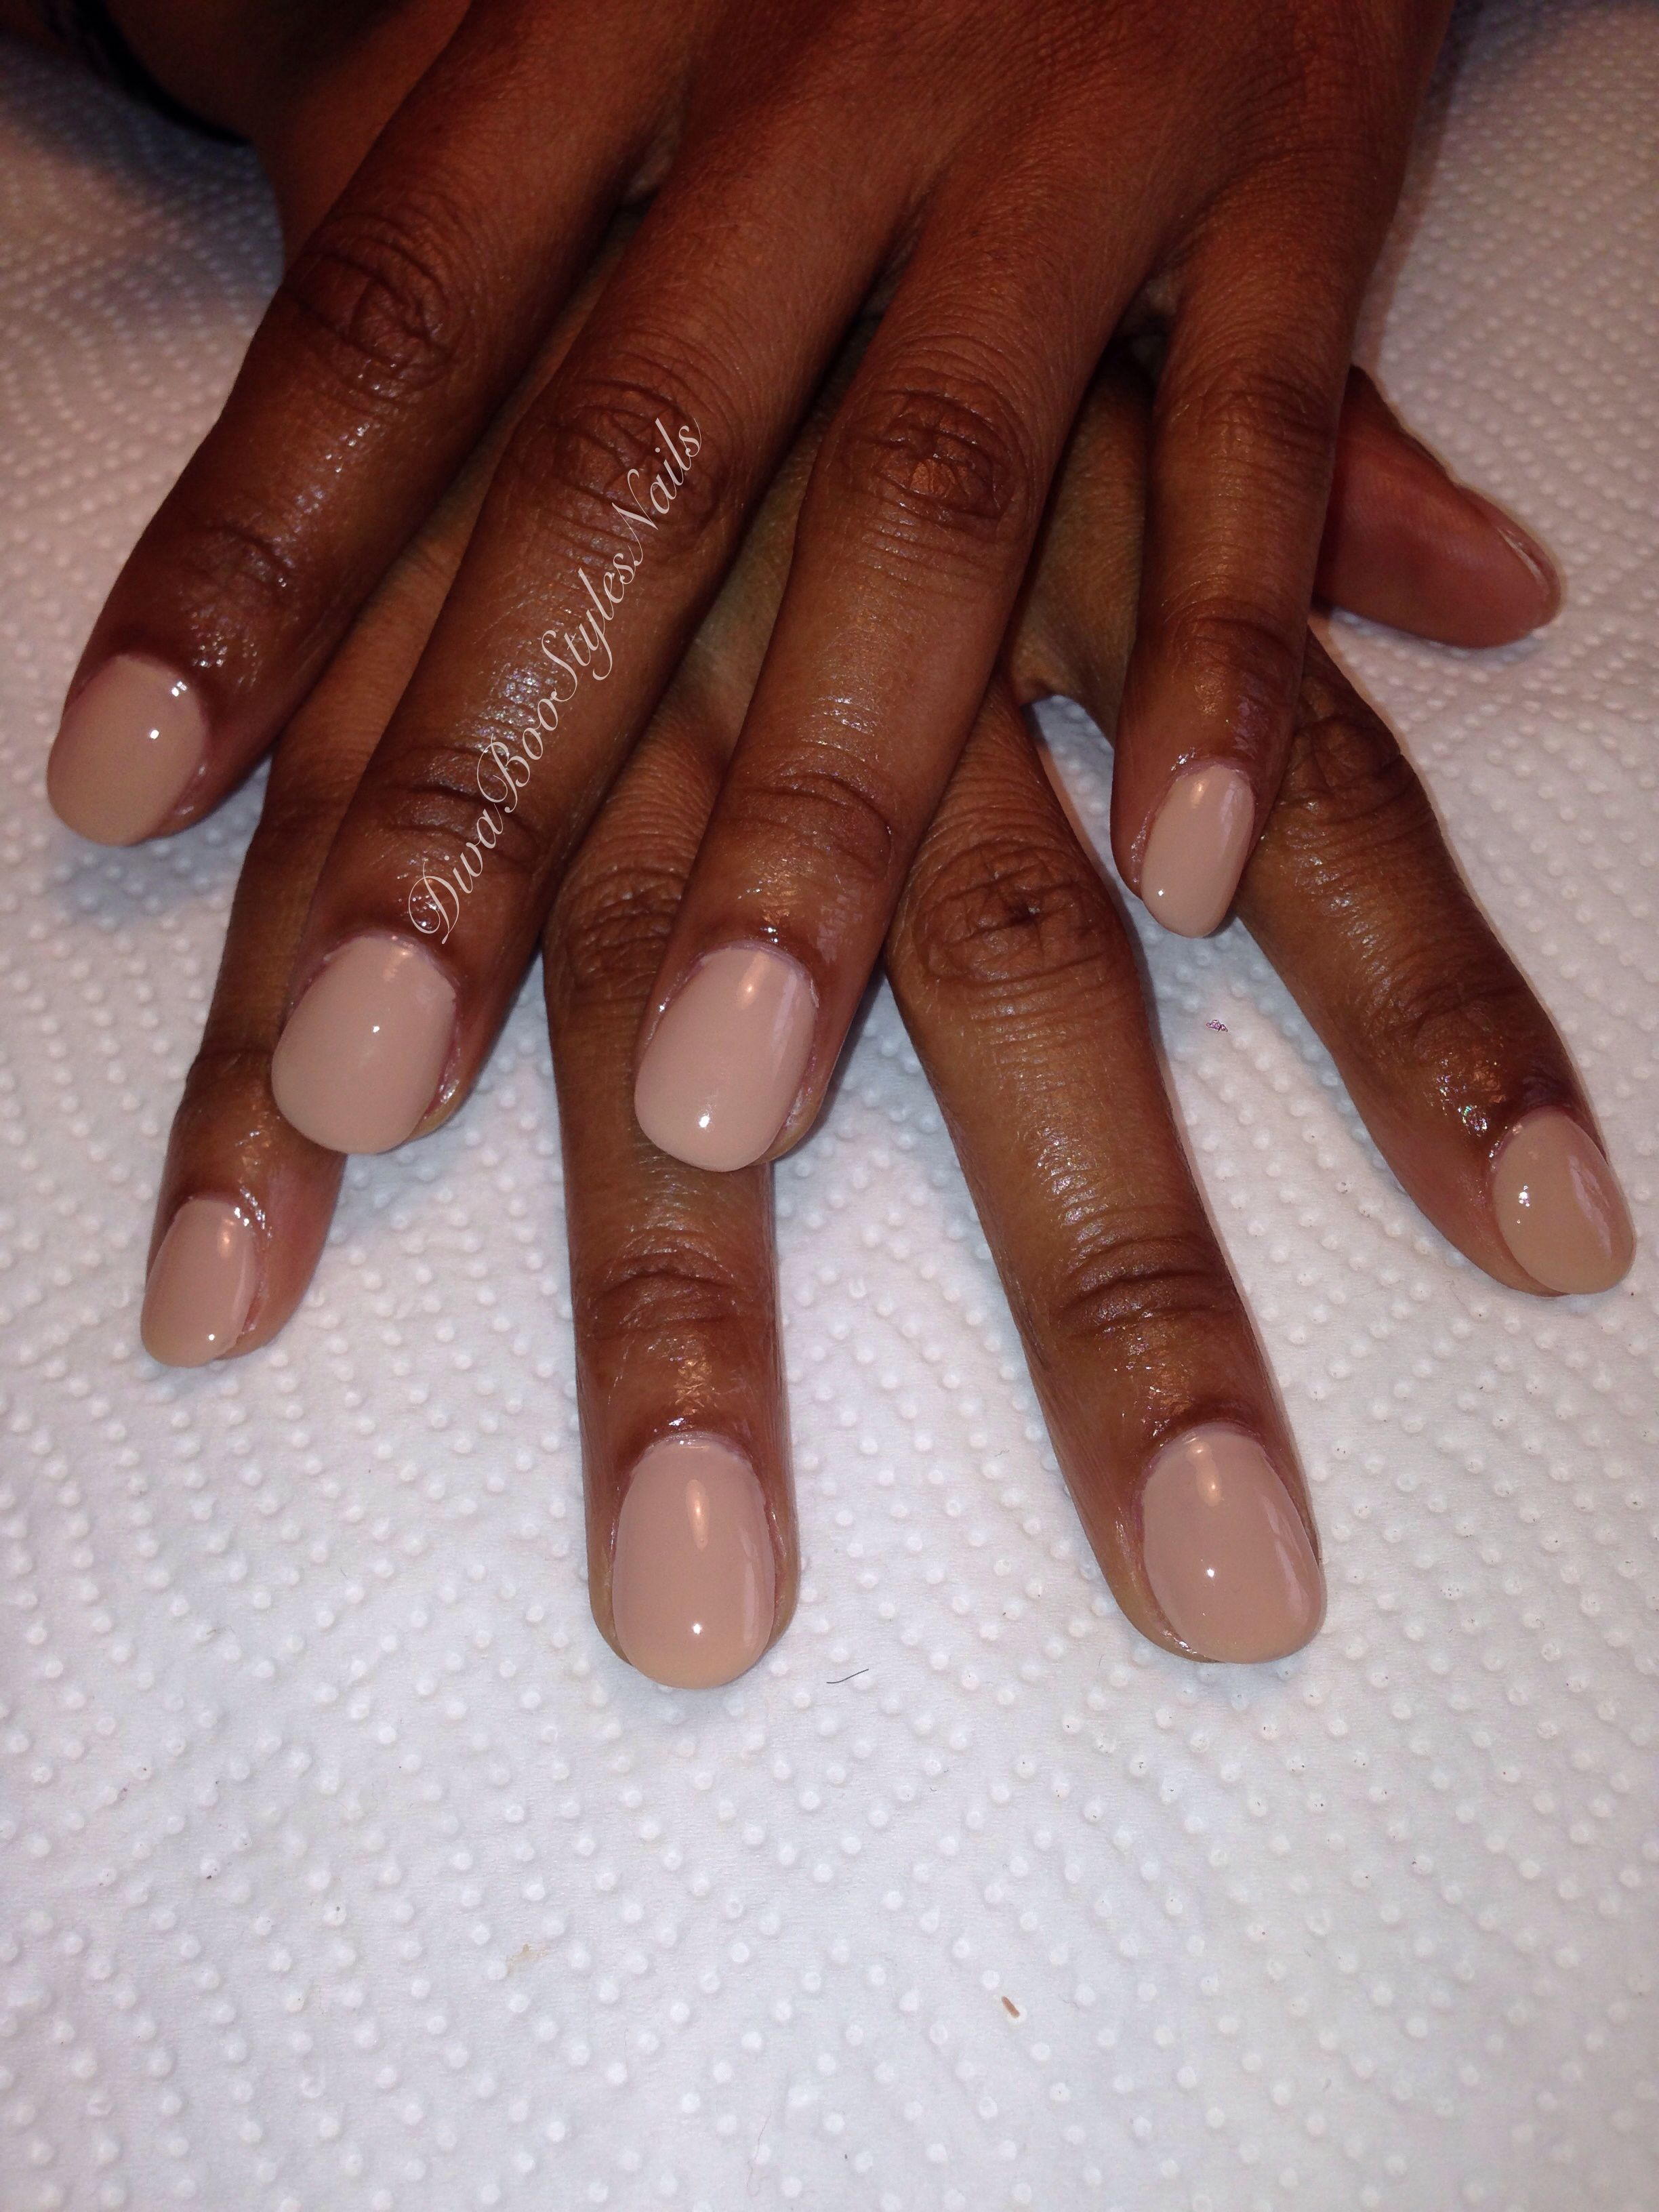 Nails inc gel nail colors and gel nail polish on pinterest - Opi Samoan Sand Round Nail Manicure Opi Nail Polishopi Nailsnail Polishesmanicuresopi Samoan Sandgel